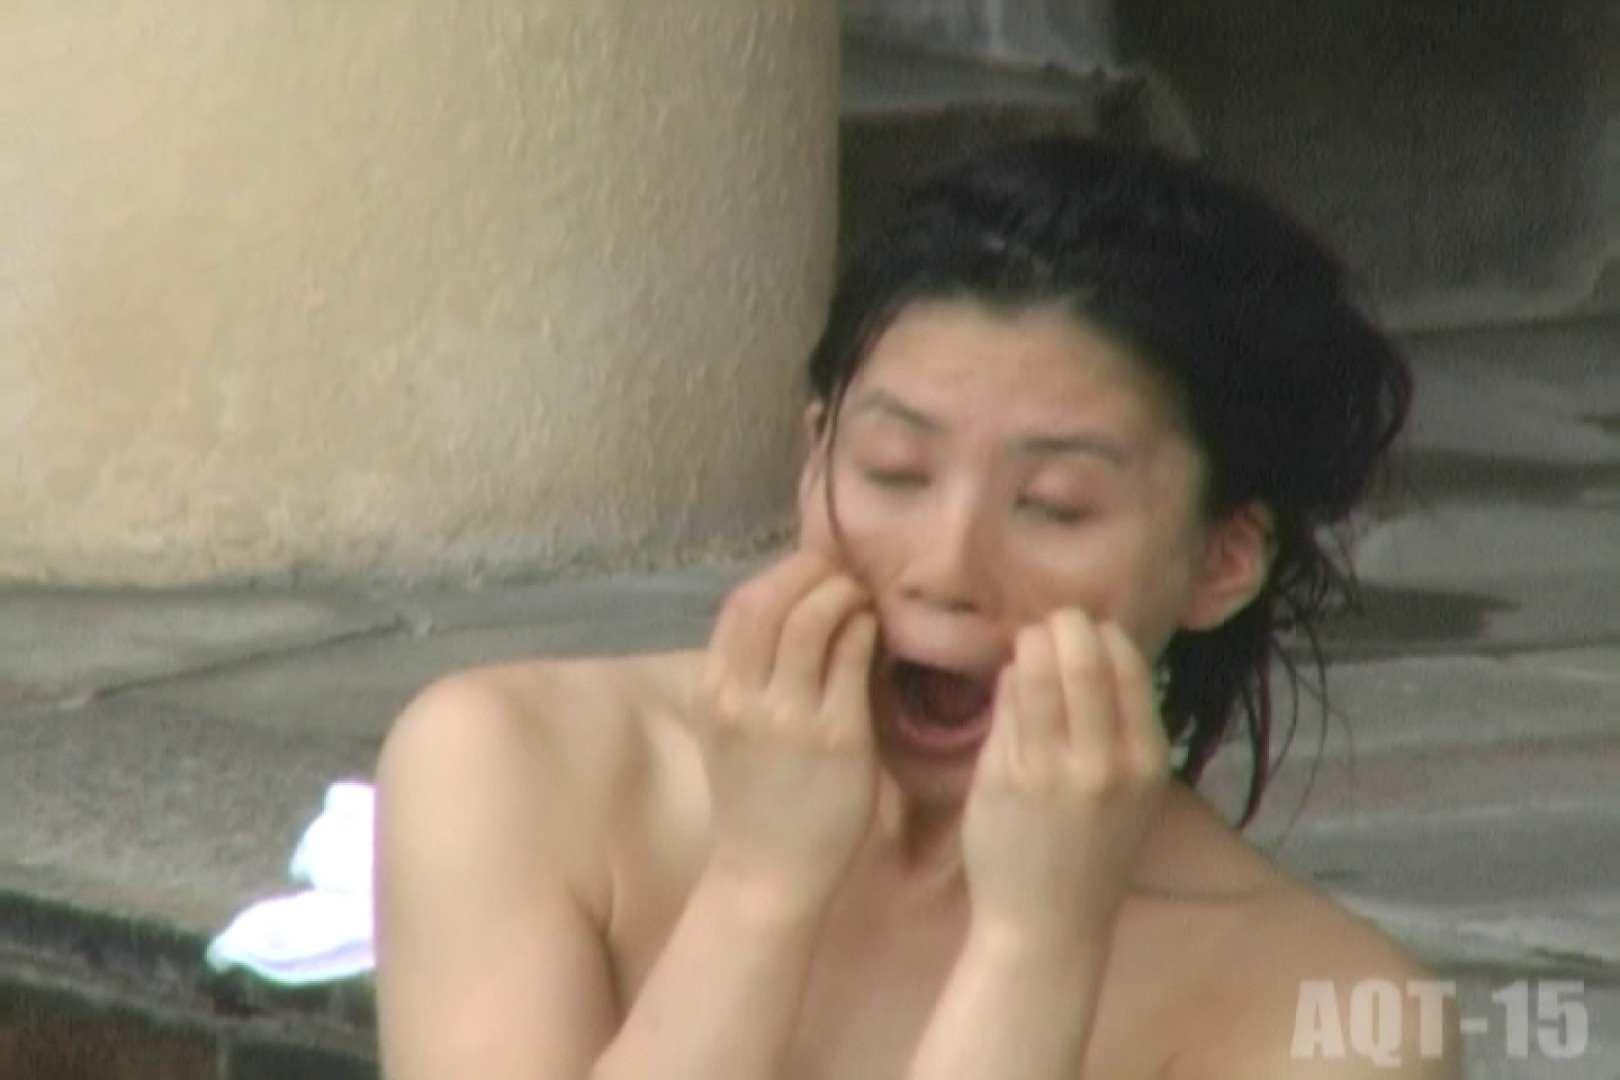 Aquaな露天風呂Vol.832 OL女体 セックス無修正動画無料 79連発 29